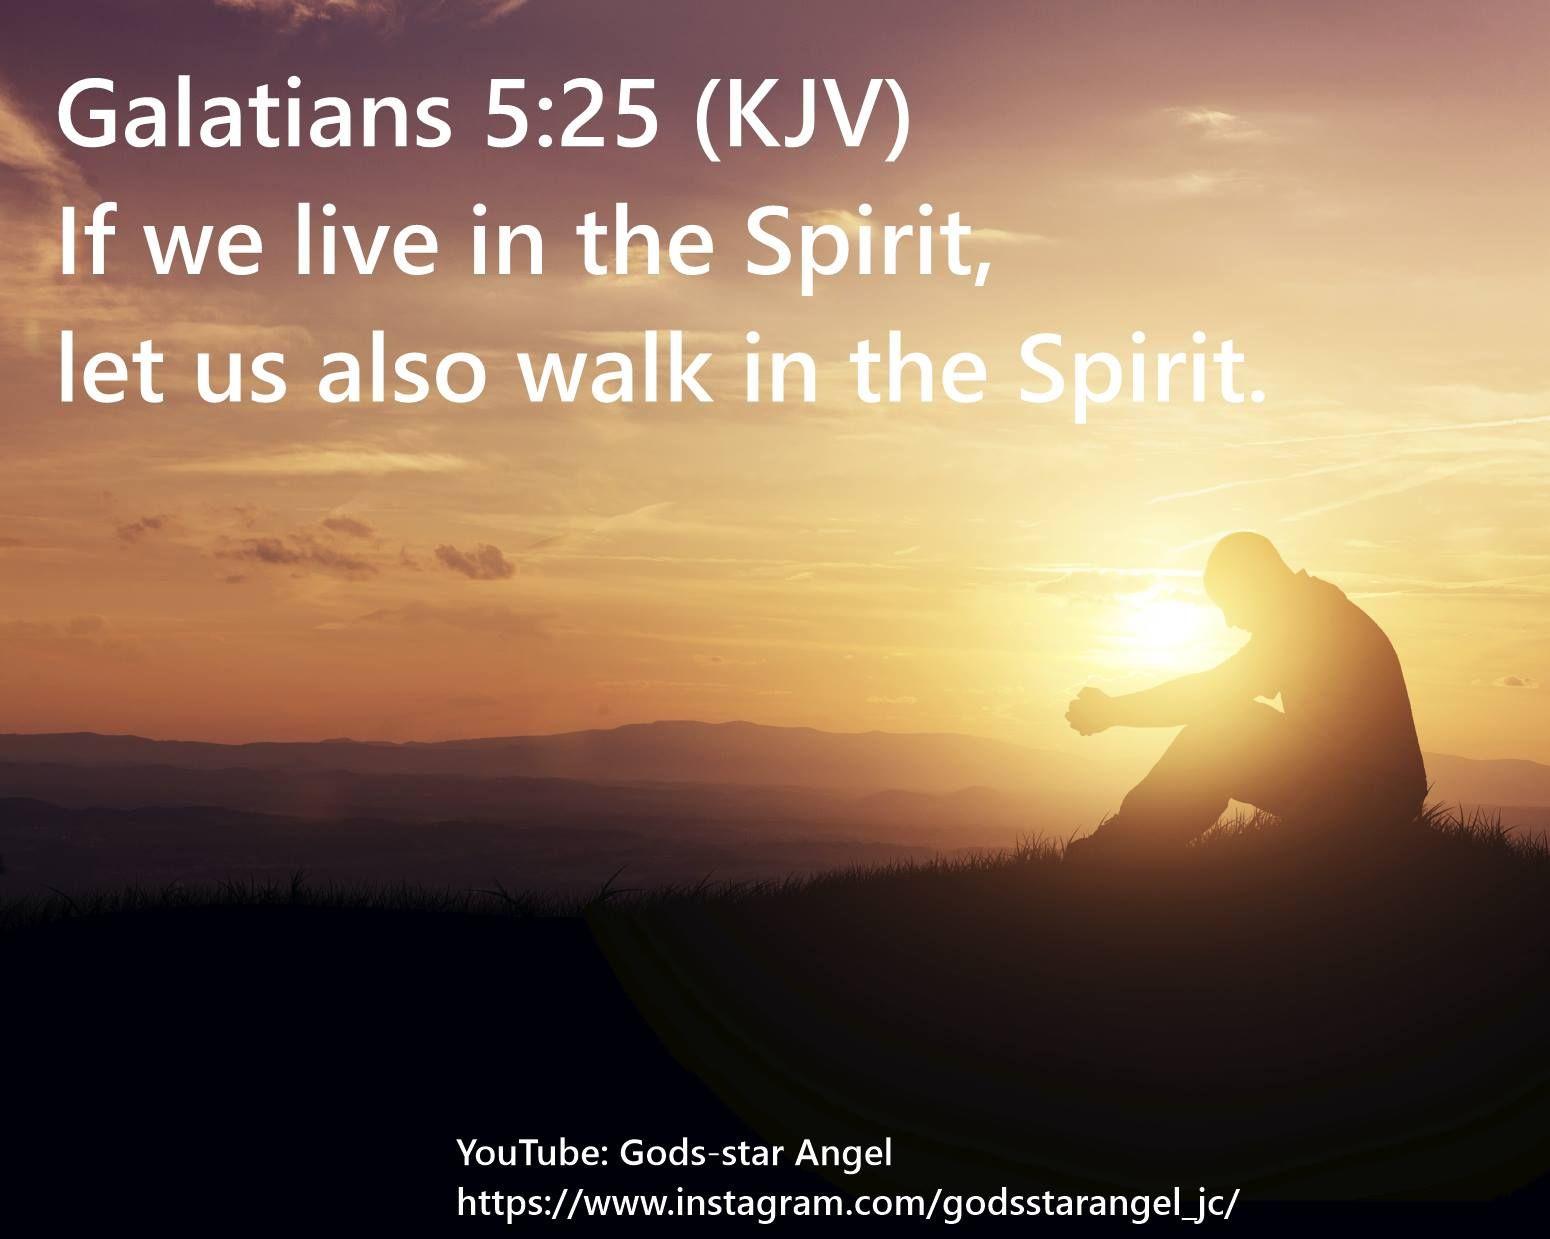 Galatians 5:25 (KJV) | Walk in the spirit, Galatians 5 25, Galatians